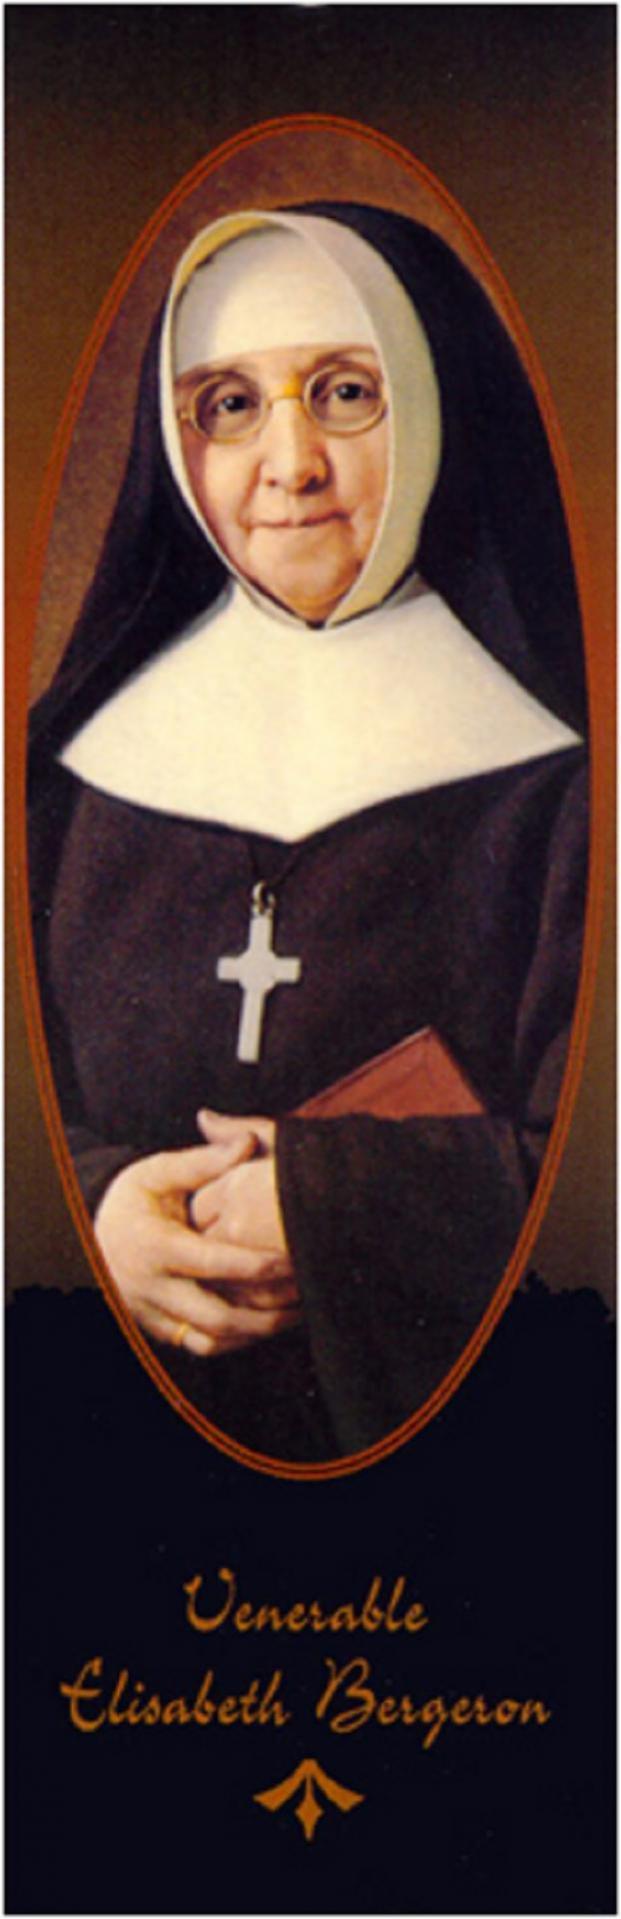 Venerable elisabeth bergeron 11